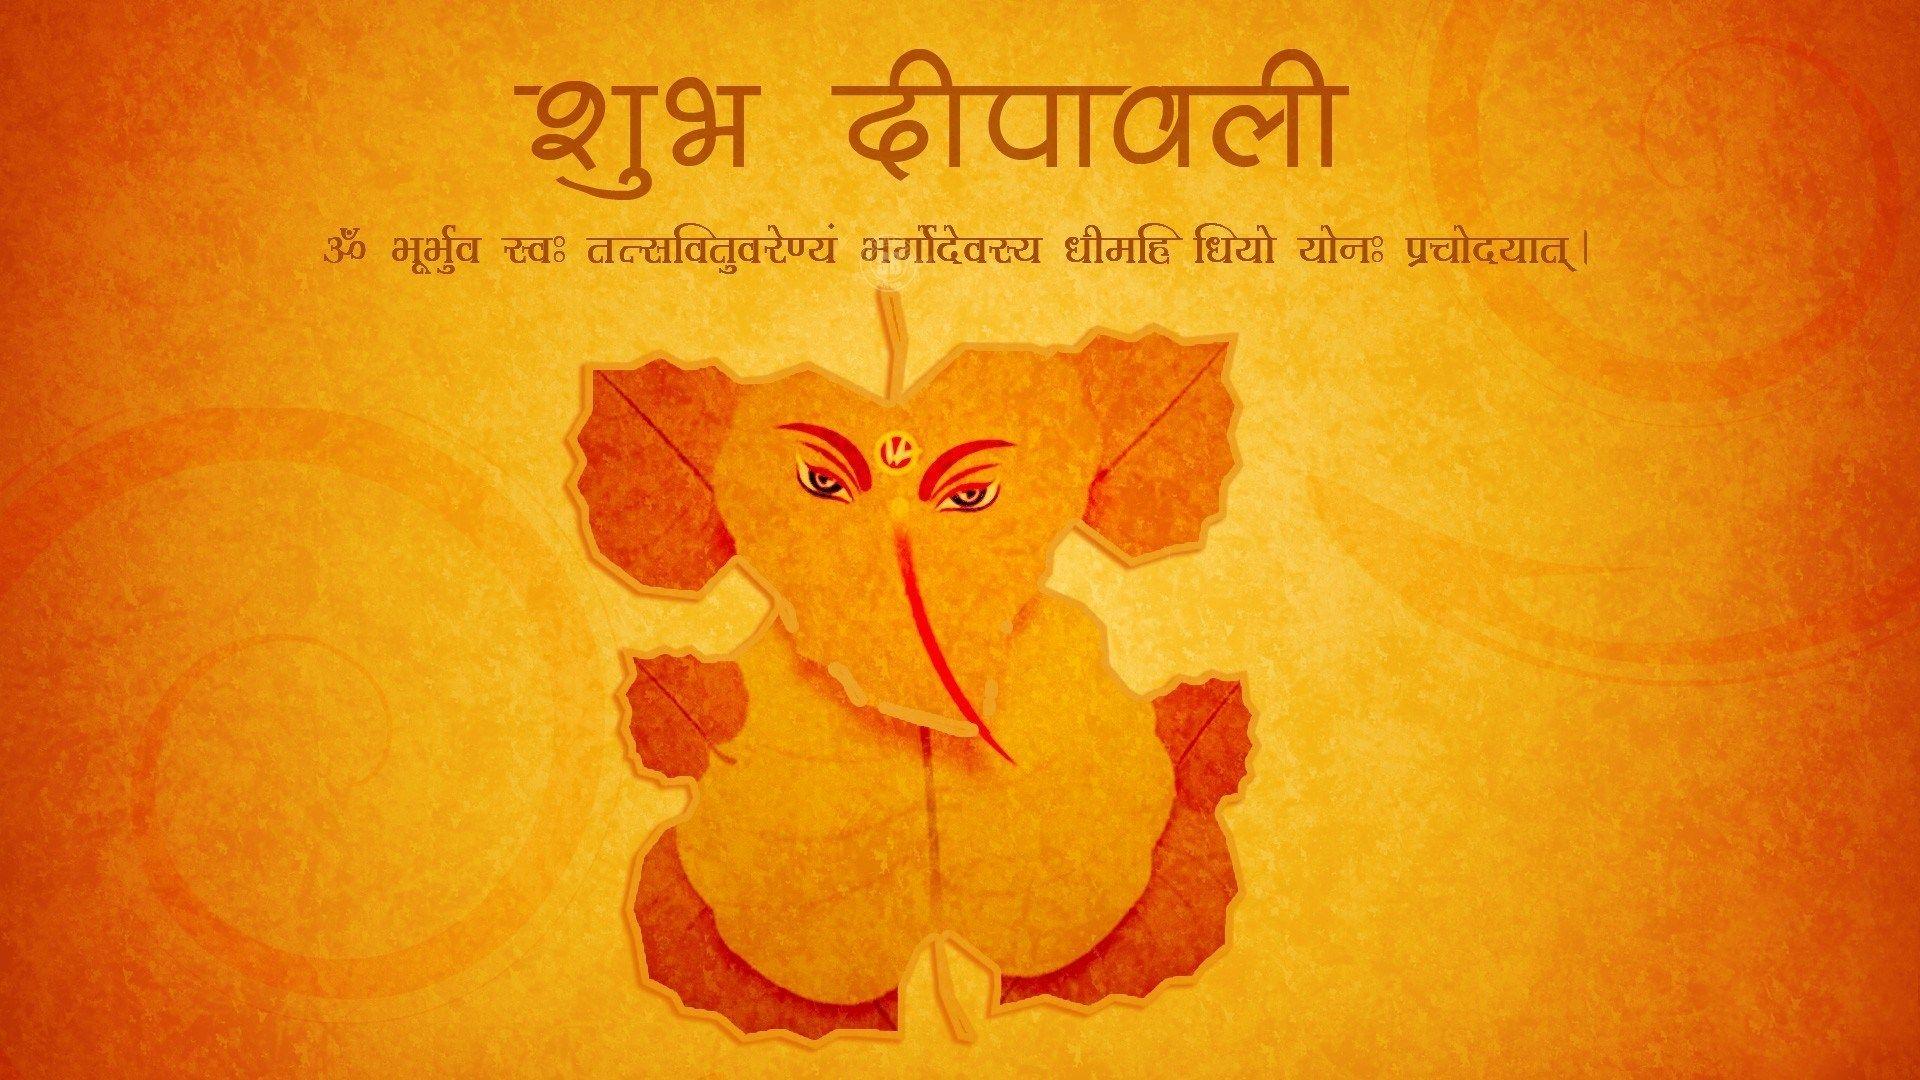 Pin by blogging on happy diwali pinterest happy diwali and diwali diwali m4hsunfo